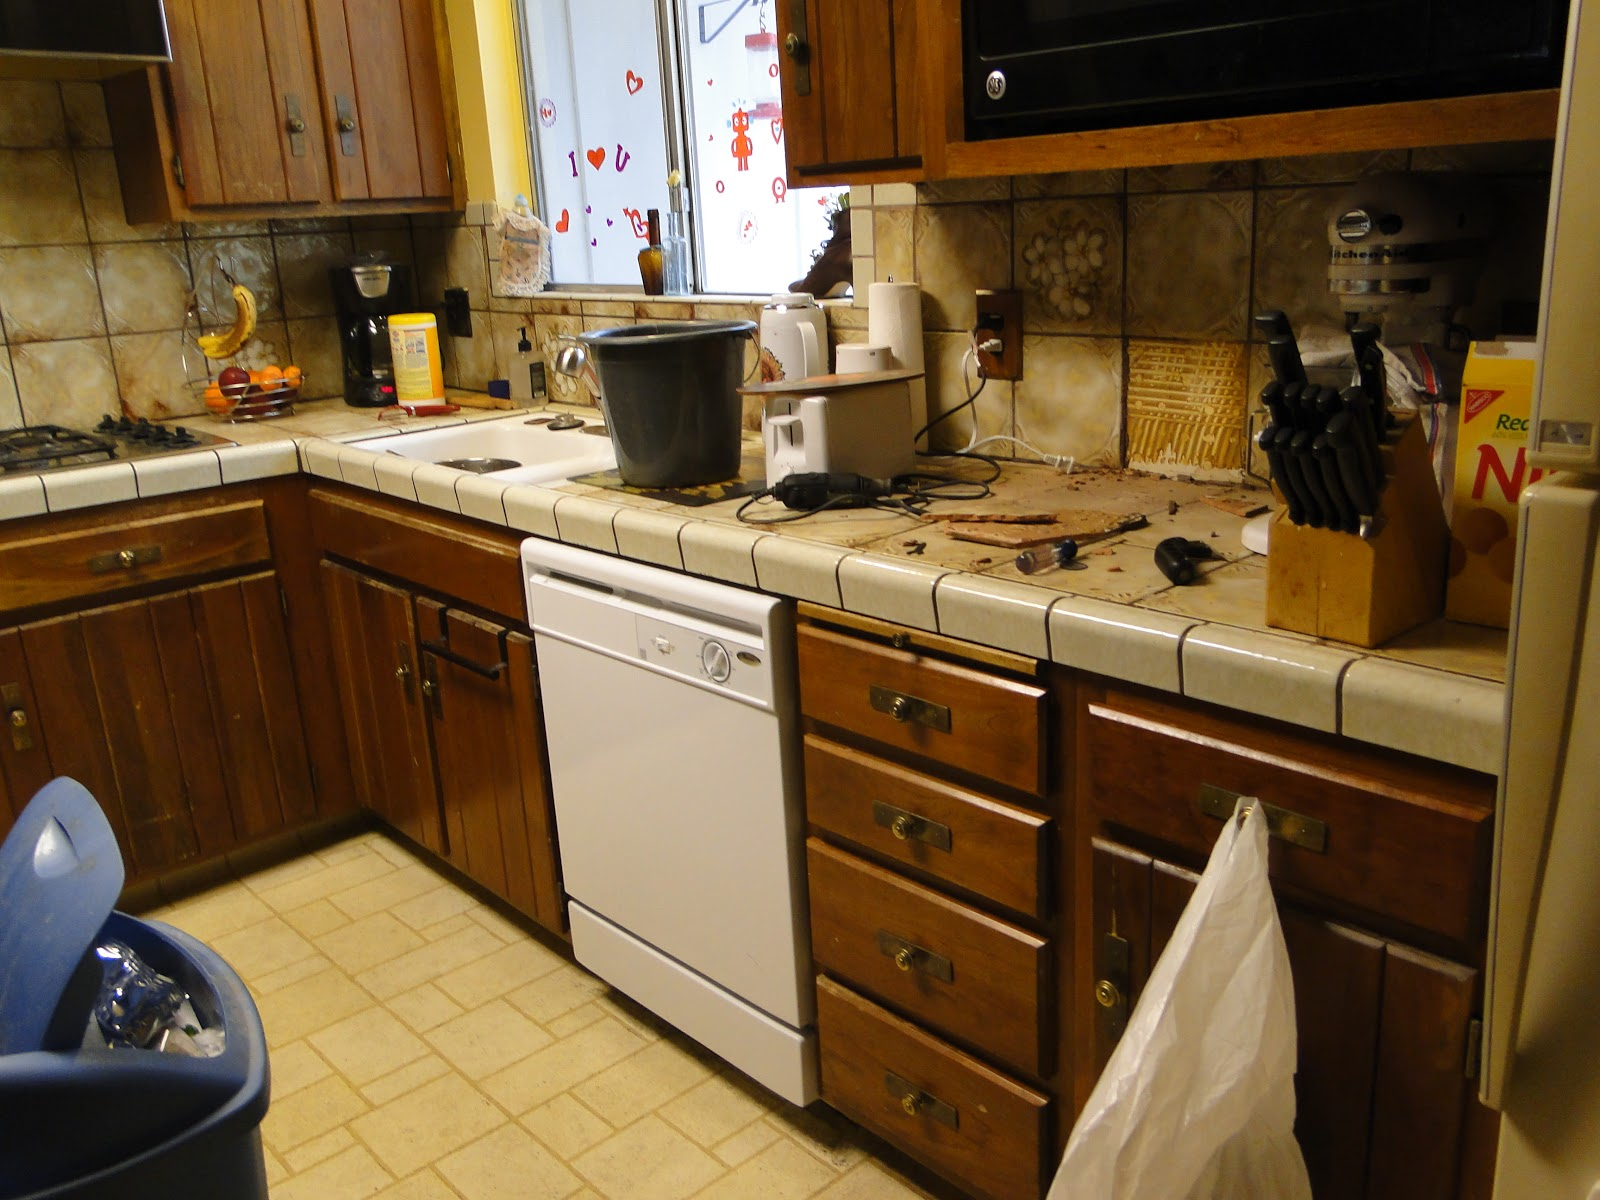 Kitchen Remodel On A Shoestring Budget